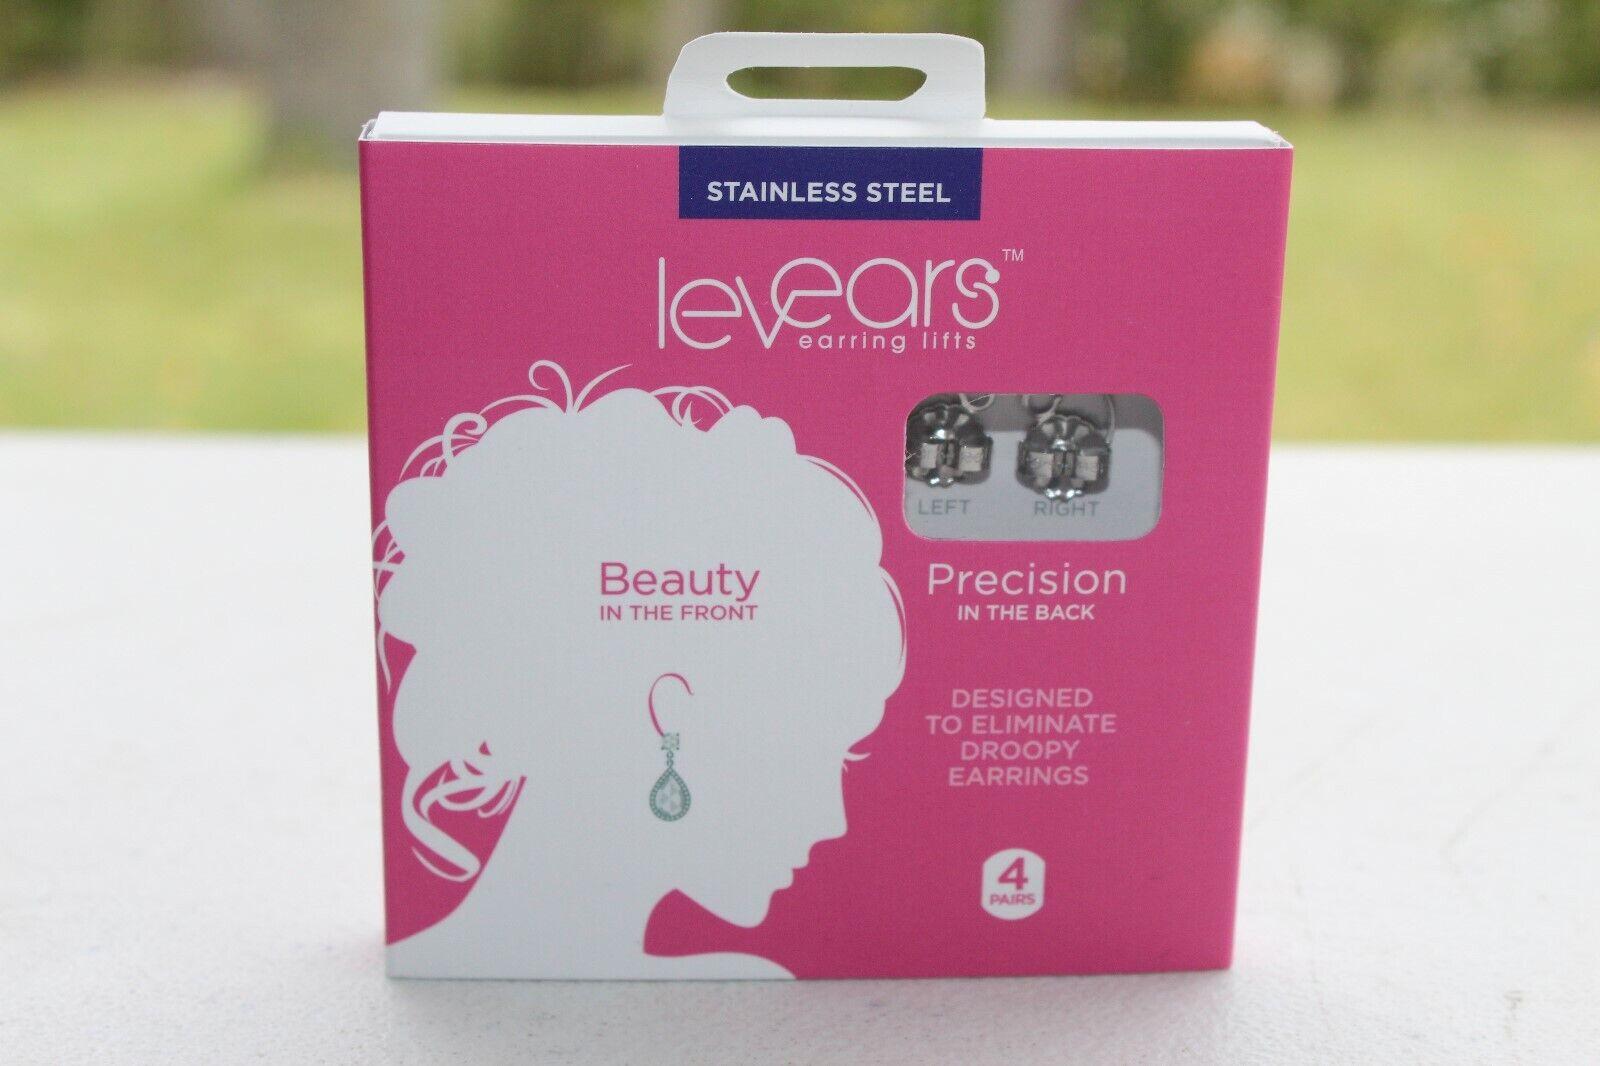 stainless steel silver earrings backs lifts